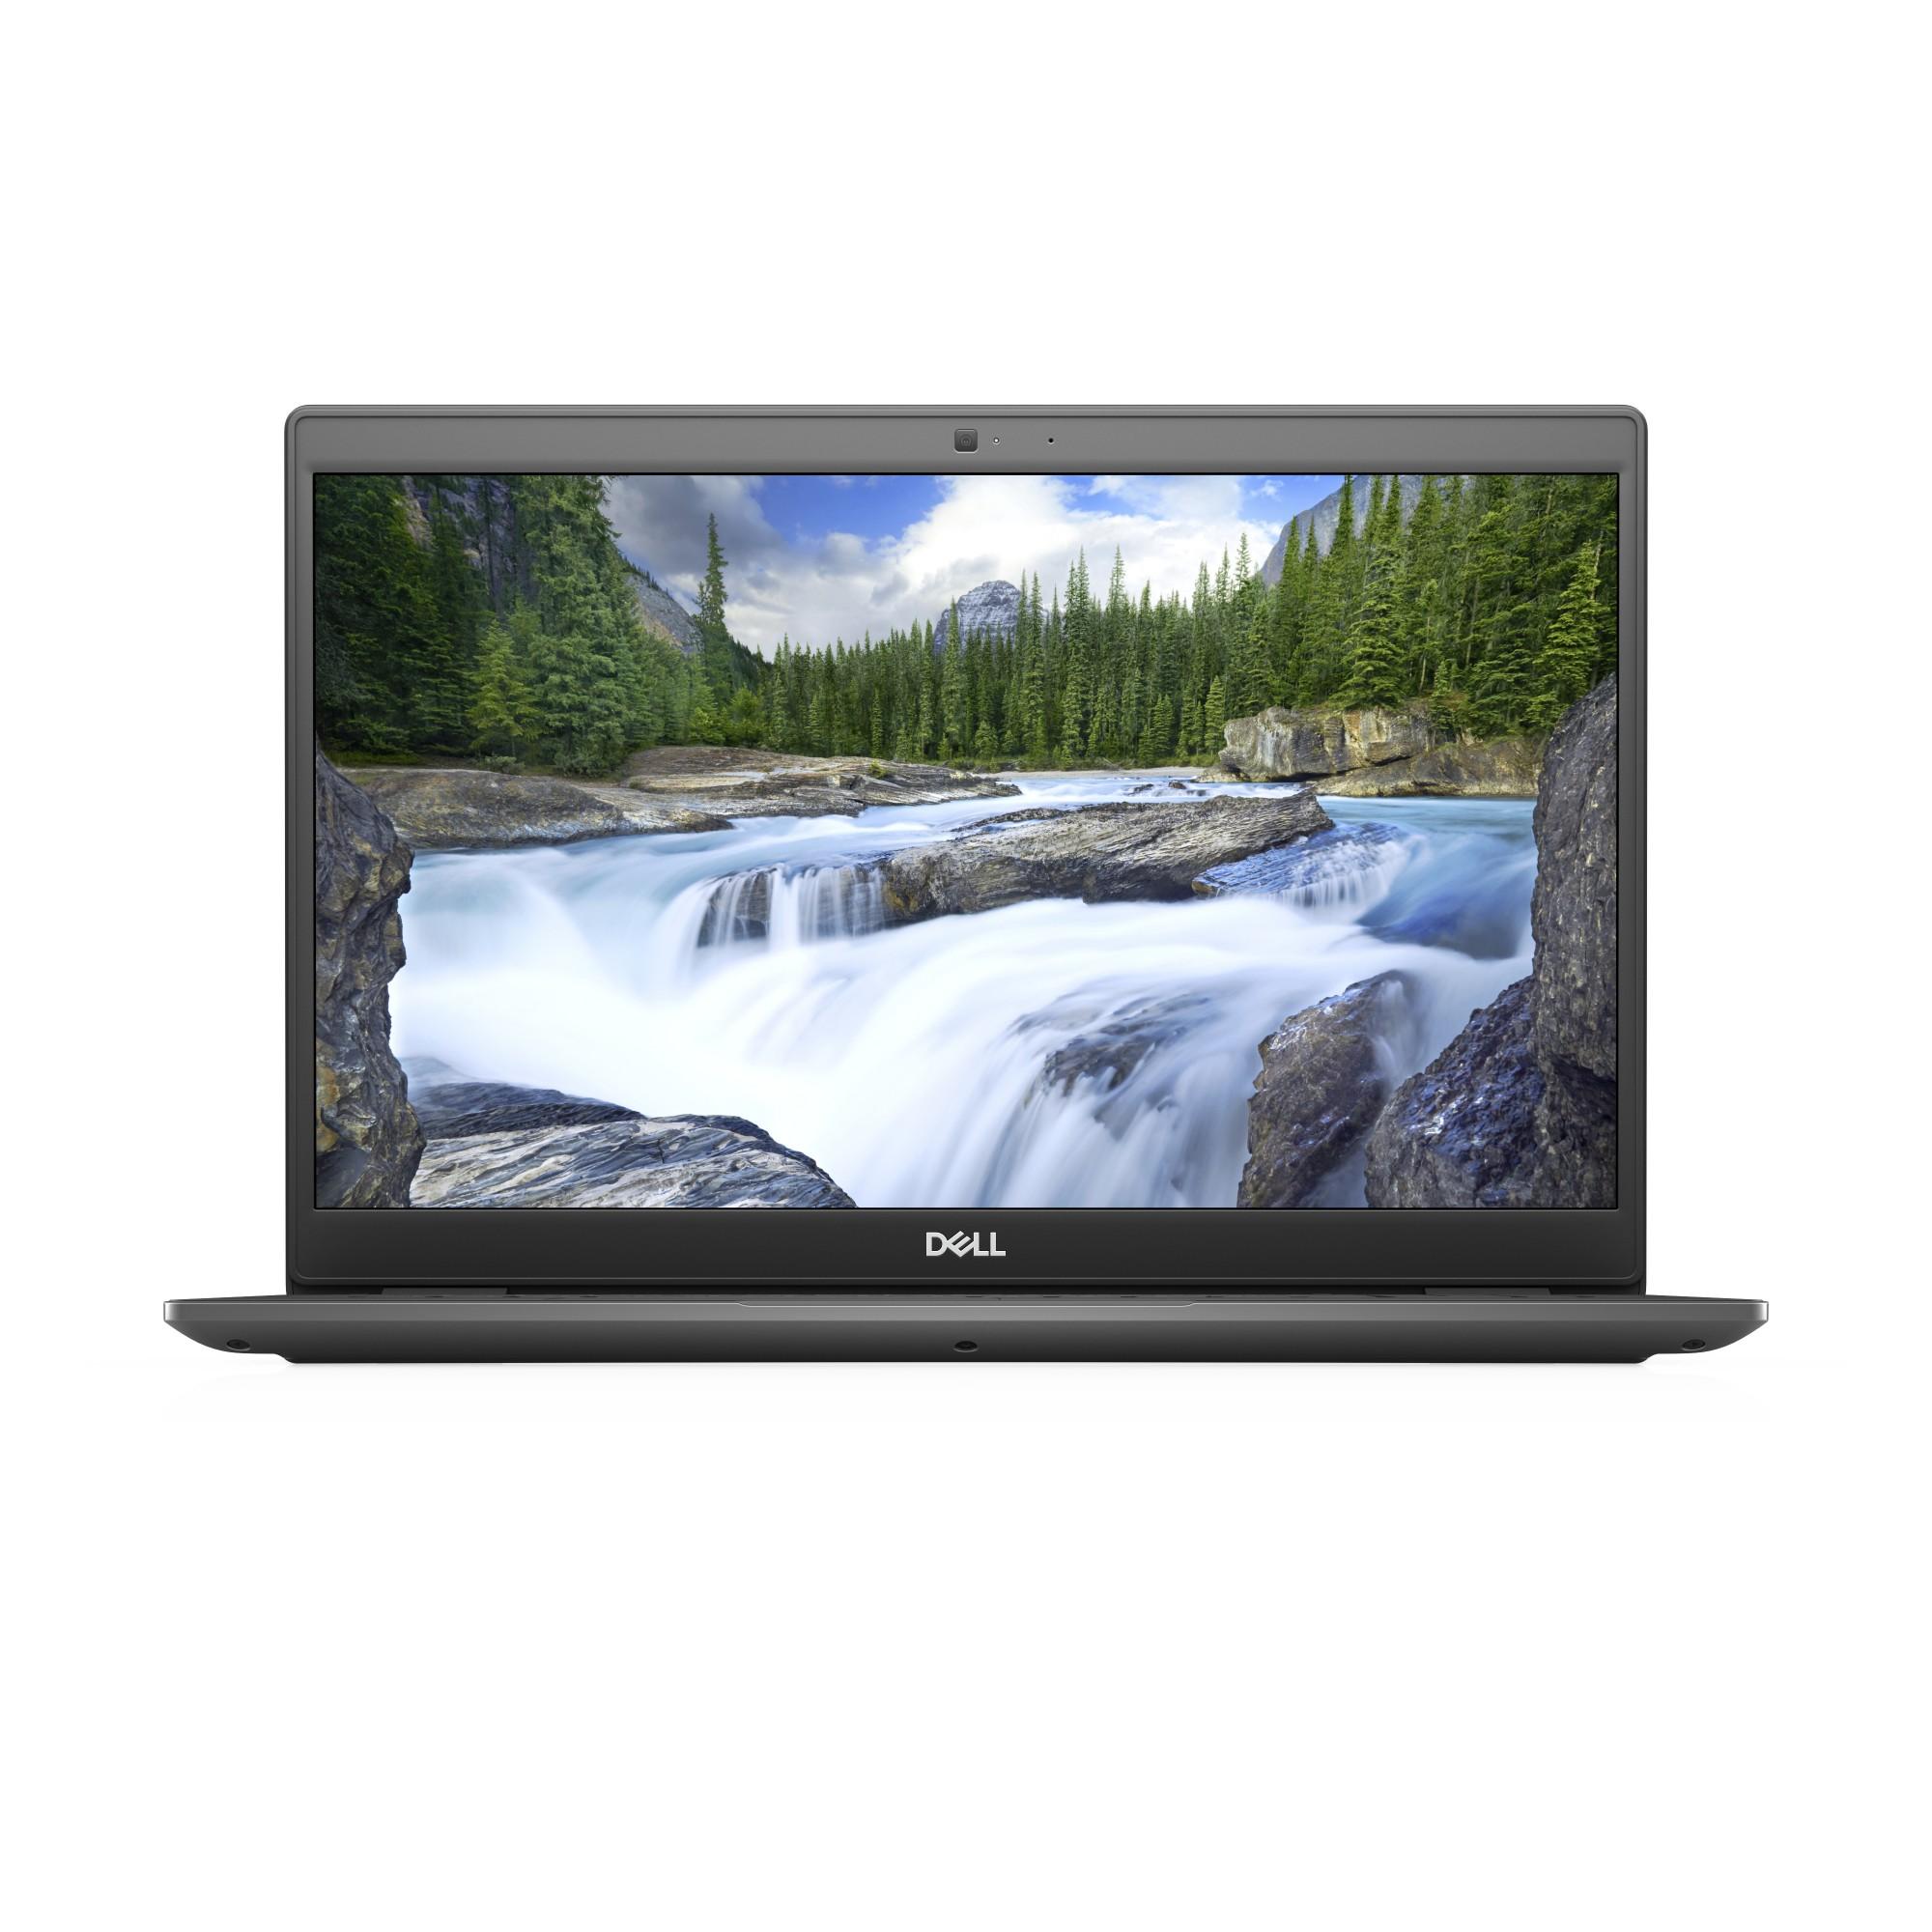 "DELL Latitude 3510 Portátil Gris 39,6 cm (15.6"") 1920 x 1080 Pixeles Intel® Core™ i5 de 10ma Generación 8 GB DDR4-SDRAM 256 GB SSD Wi-Fi 6 (802.11ax) Windows 10 Pro"